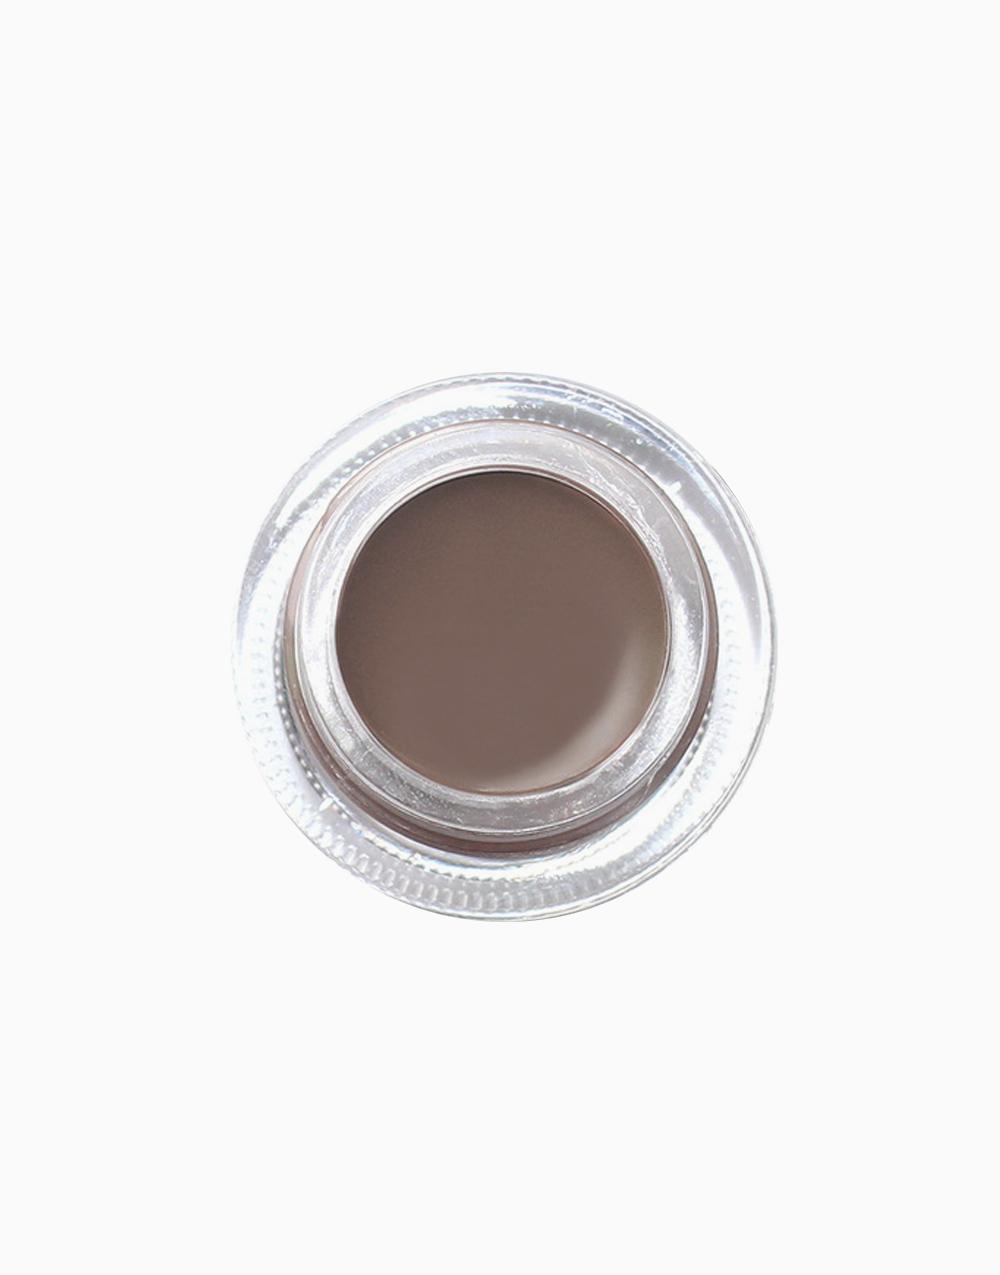 Tinted Eyebrow Pomade by Imagic | #3 Medium Brown